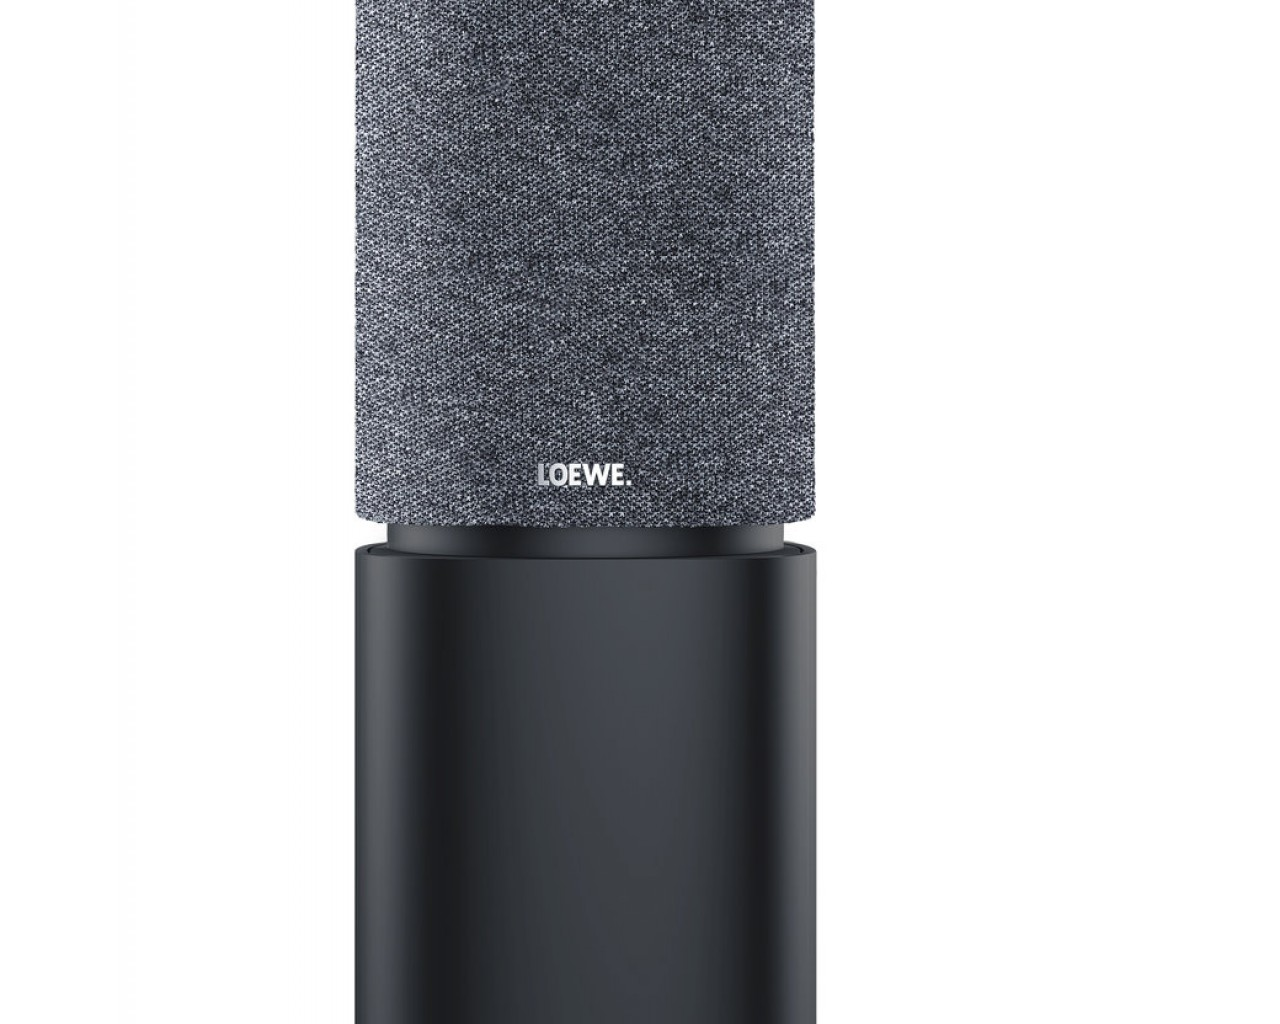 LOEWE klang 5 light grey